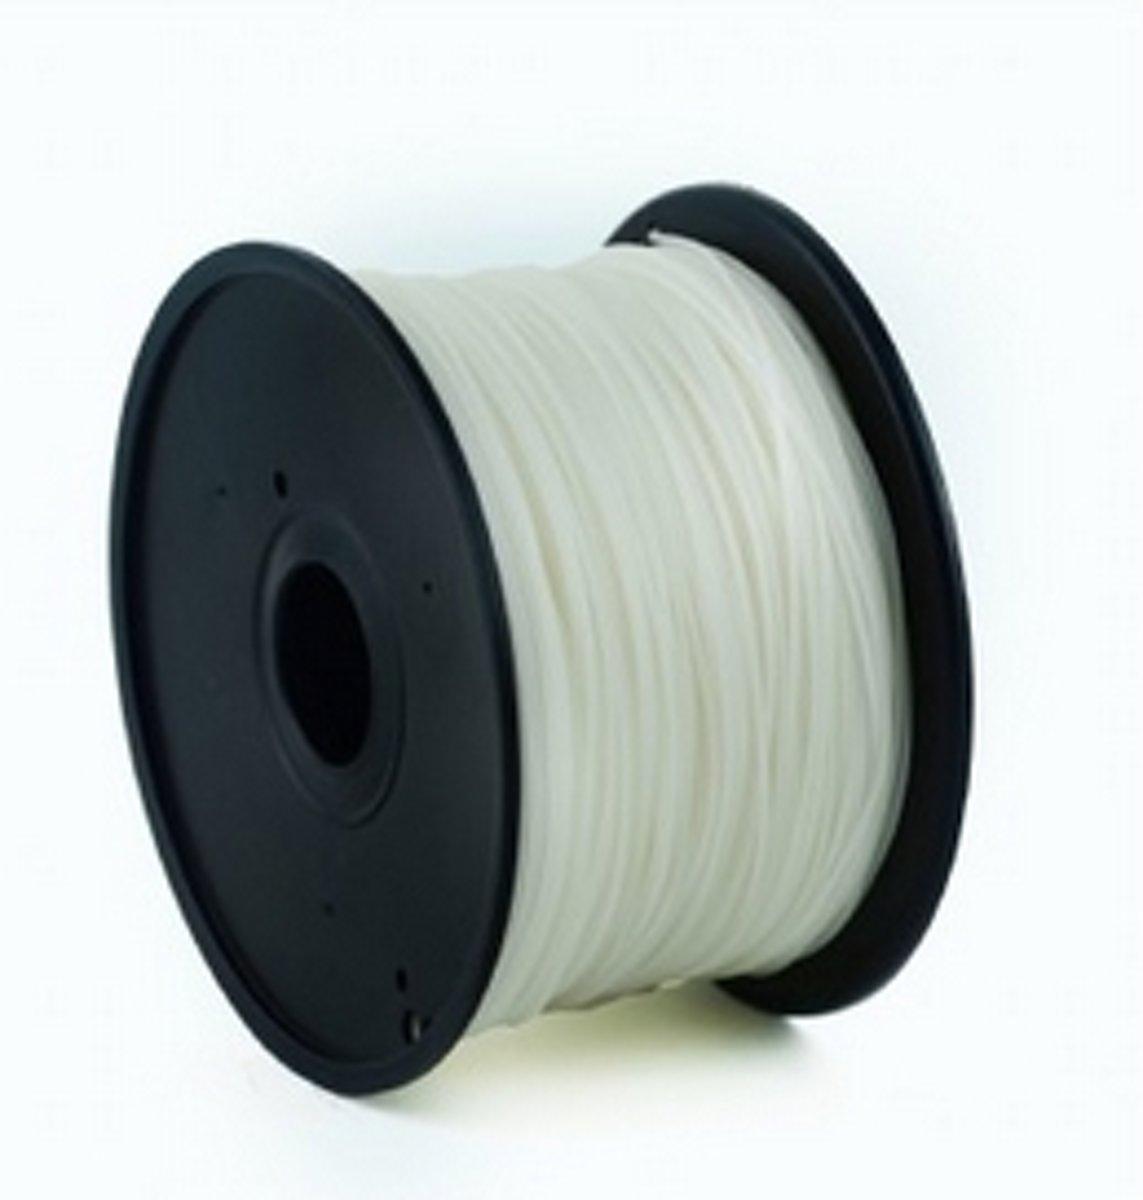 Gembird3 3DP-ABS3-01-NAT - Filament ABS, 3 mm, naturel